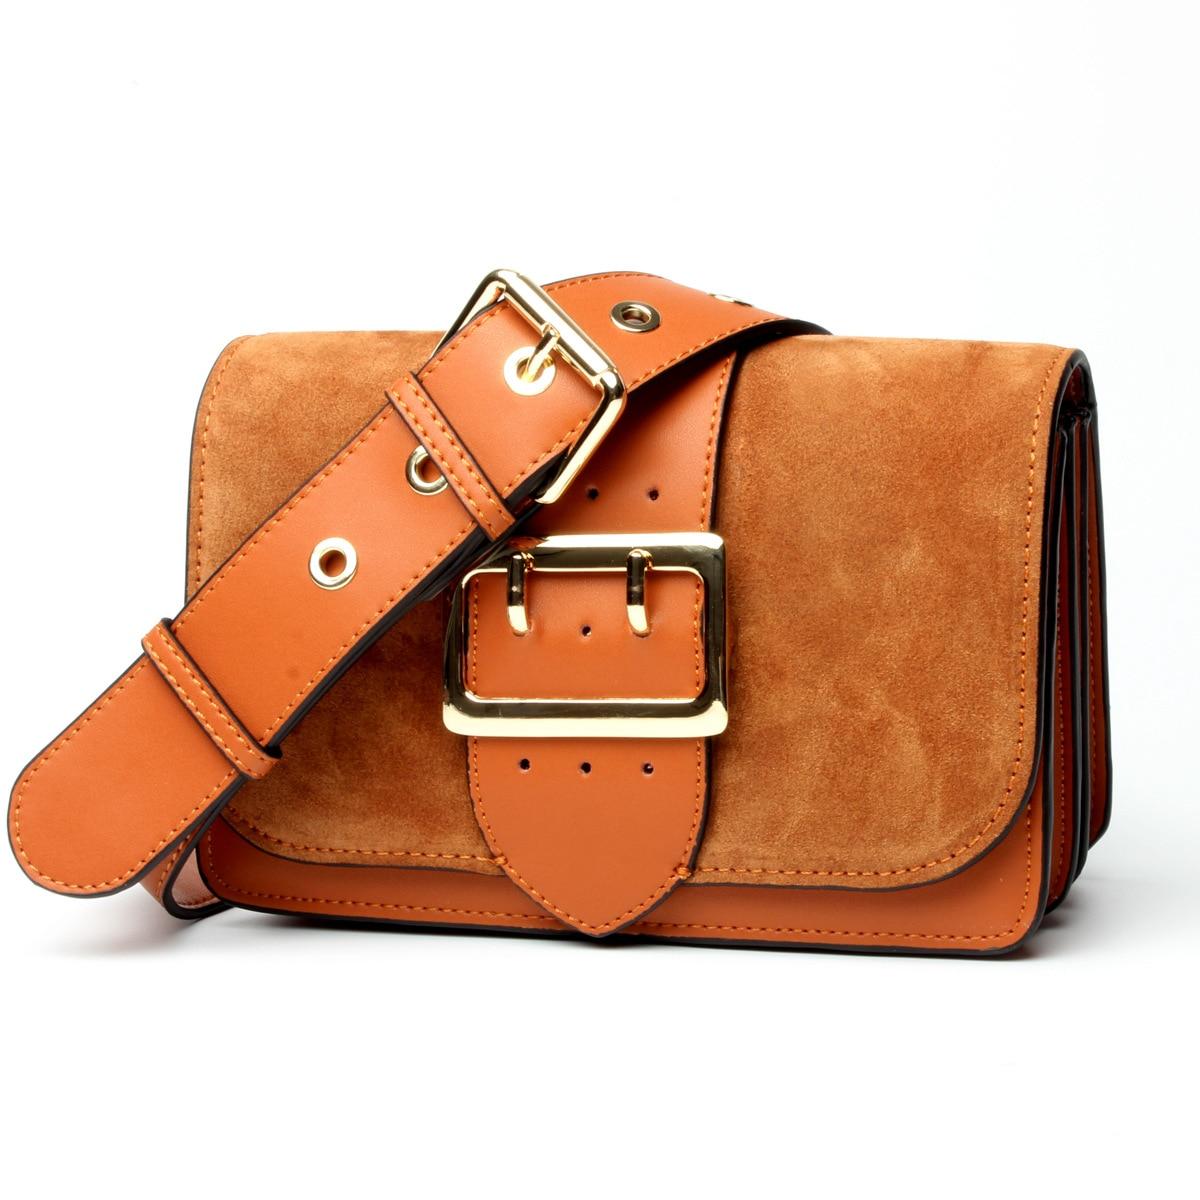 100% Genuine Leather Chain Bag Small Package Famous Brand Ring Bag Female Messenger Bag Scrub Leather Handbag Square Bag famous brand bag 100